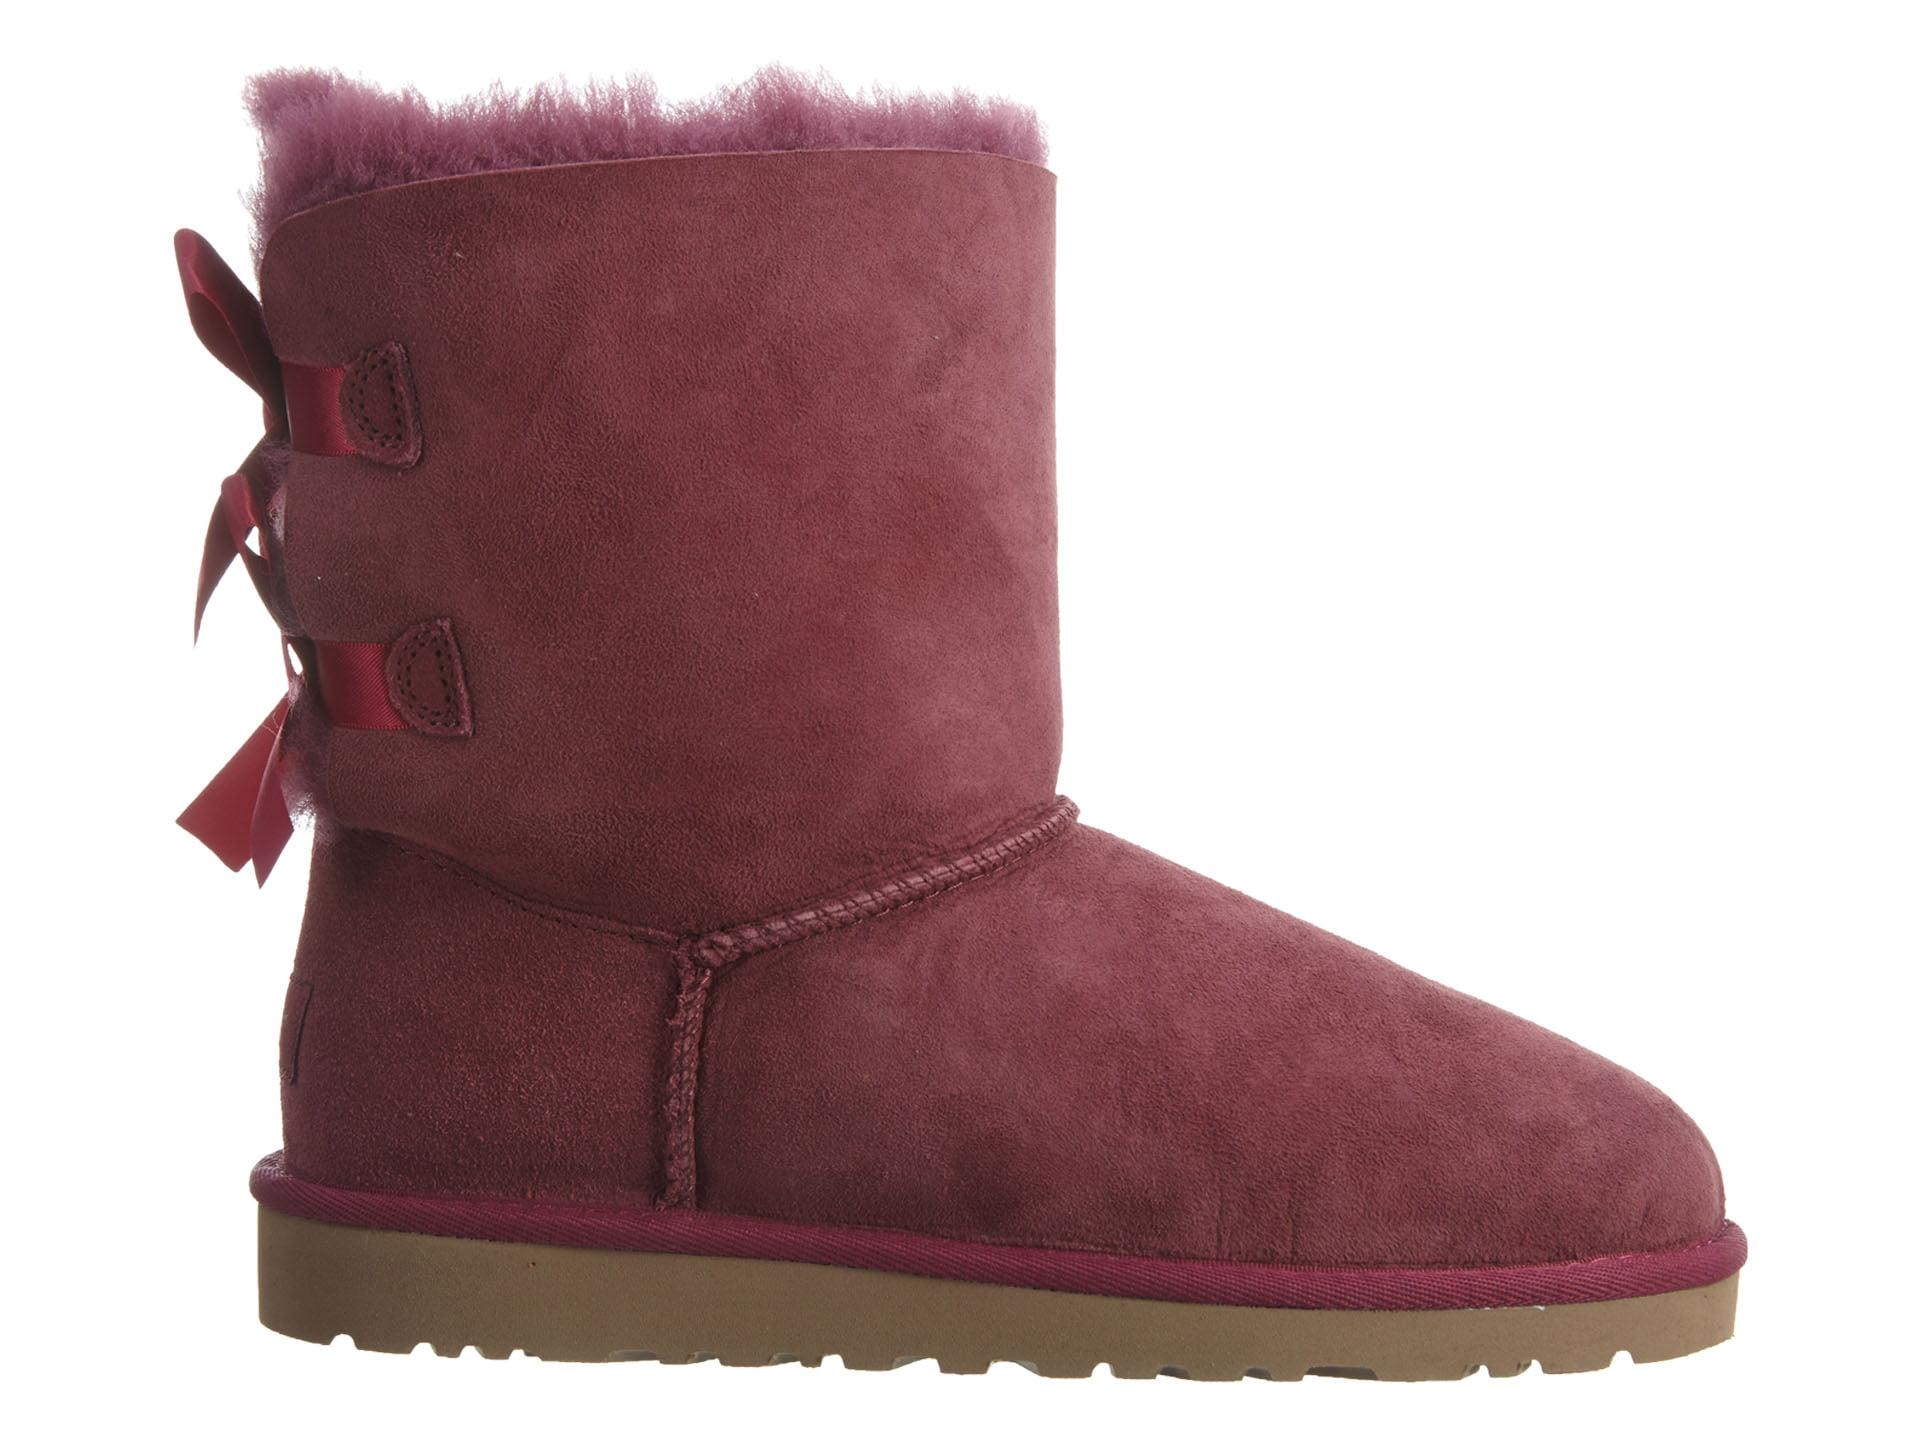 4ee6ace2ea5 UGG Australia Bailey Bow Boots -Kid's